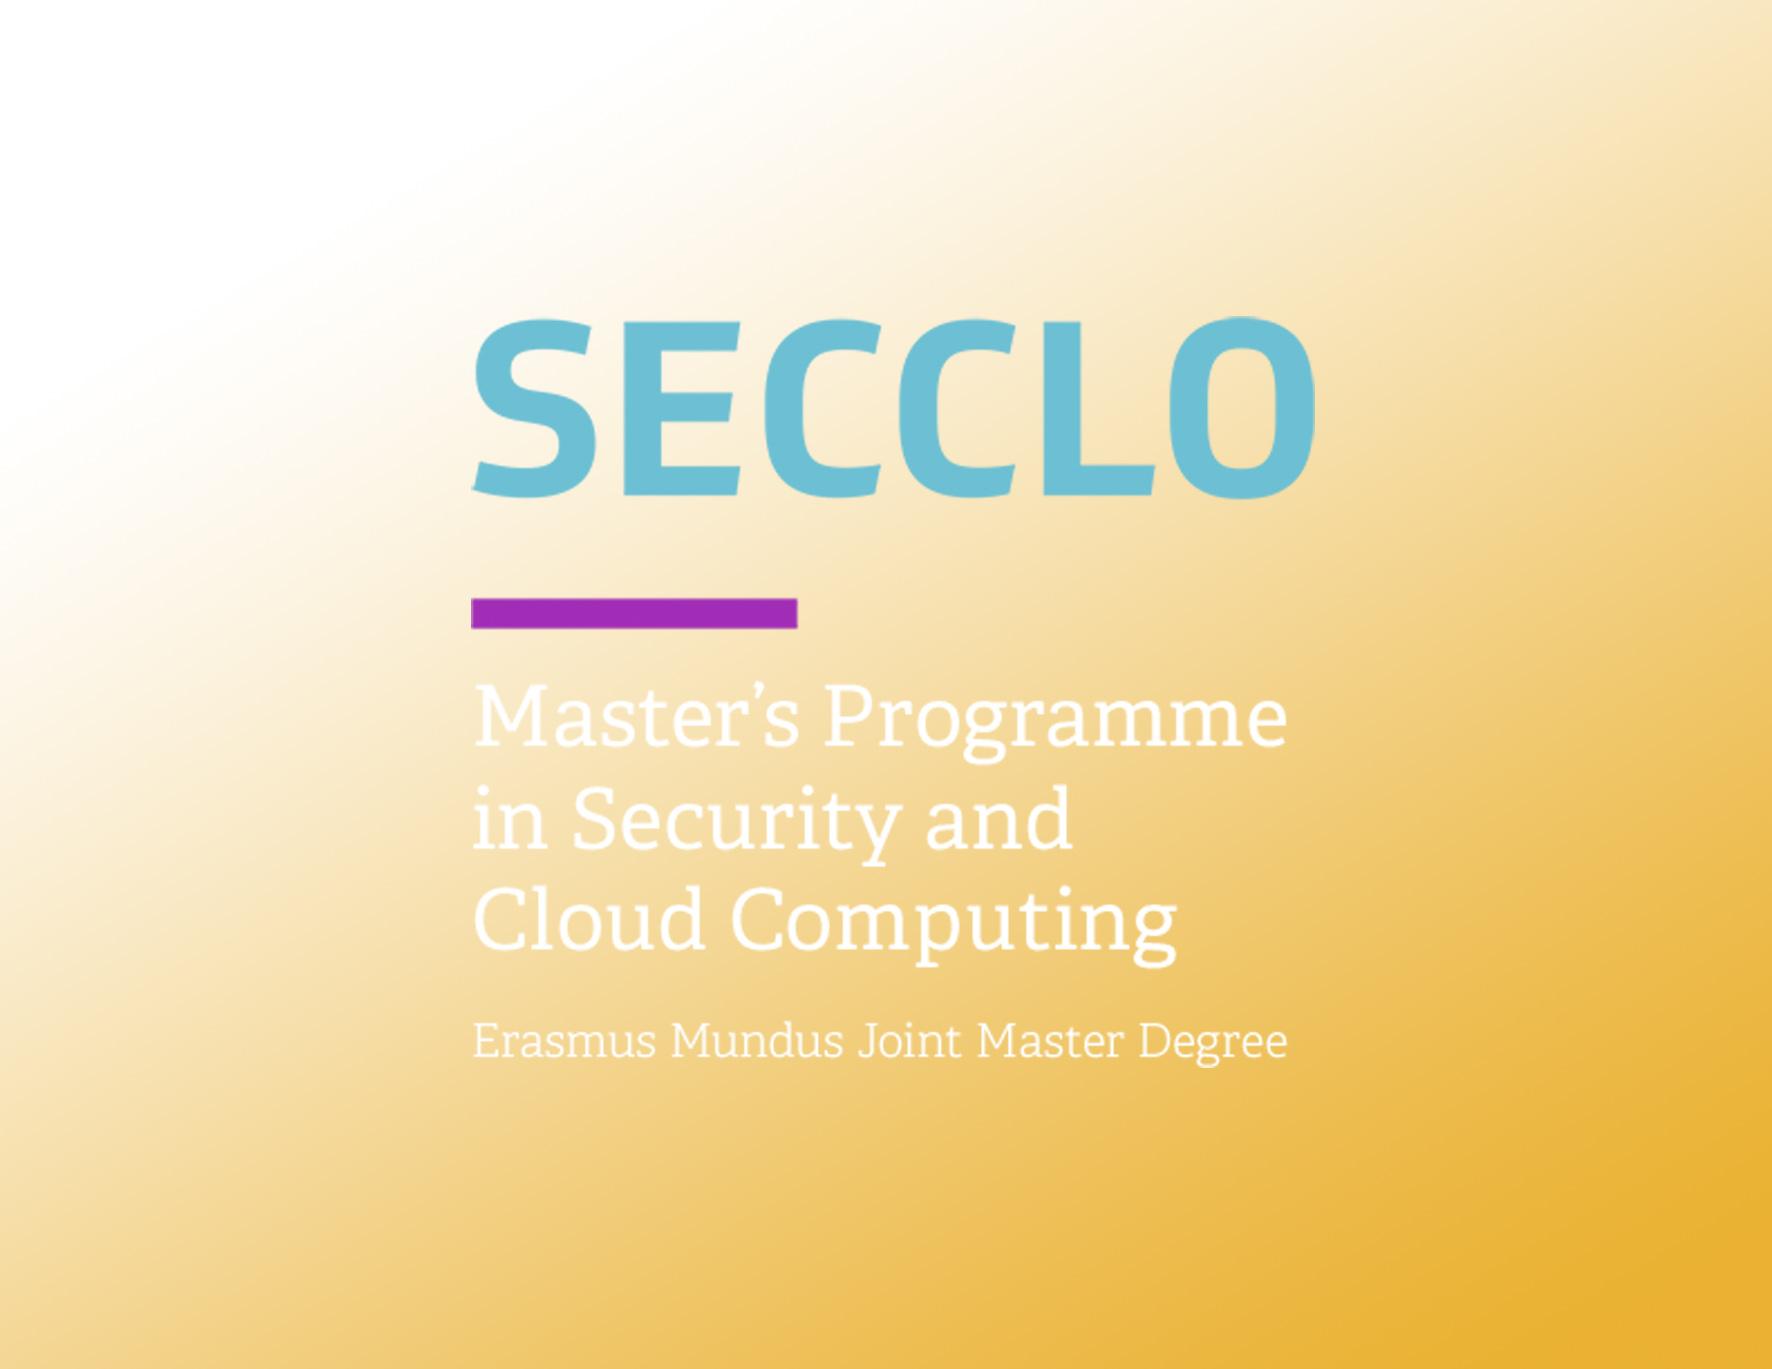 Stipendije za studente iz Bosne i Hercegovine za program SECCLO